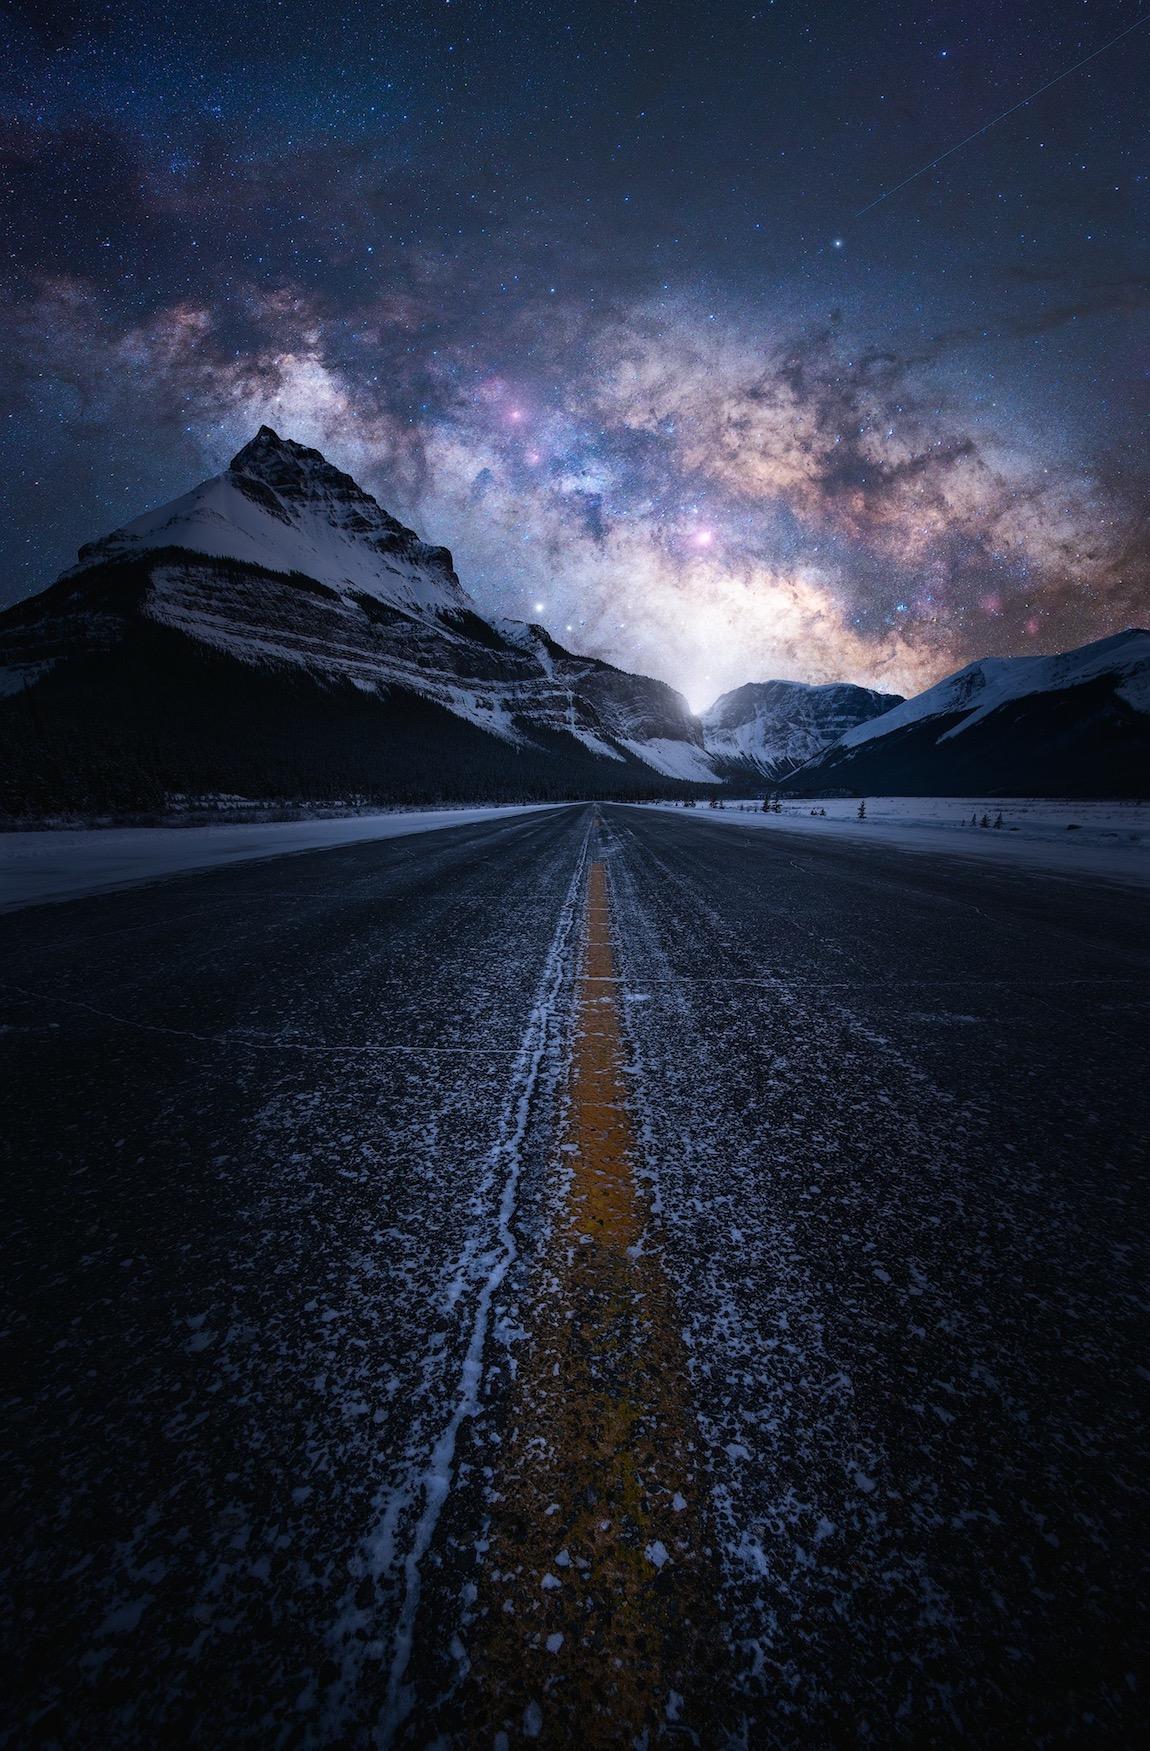 night-landscape-photography-13